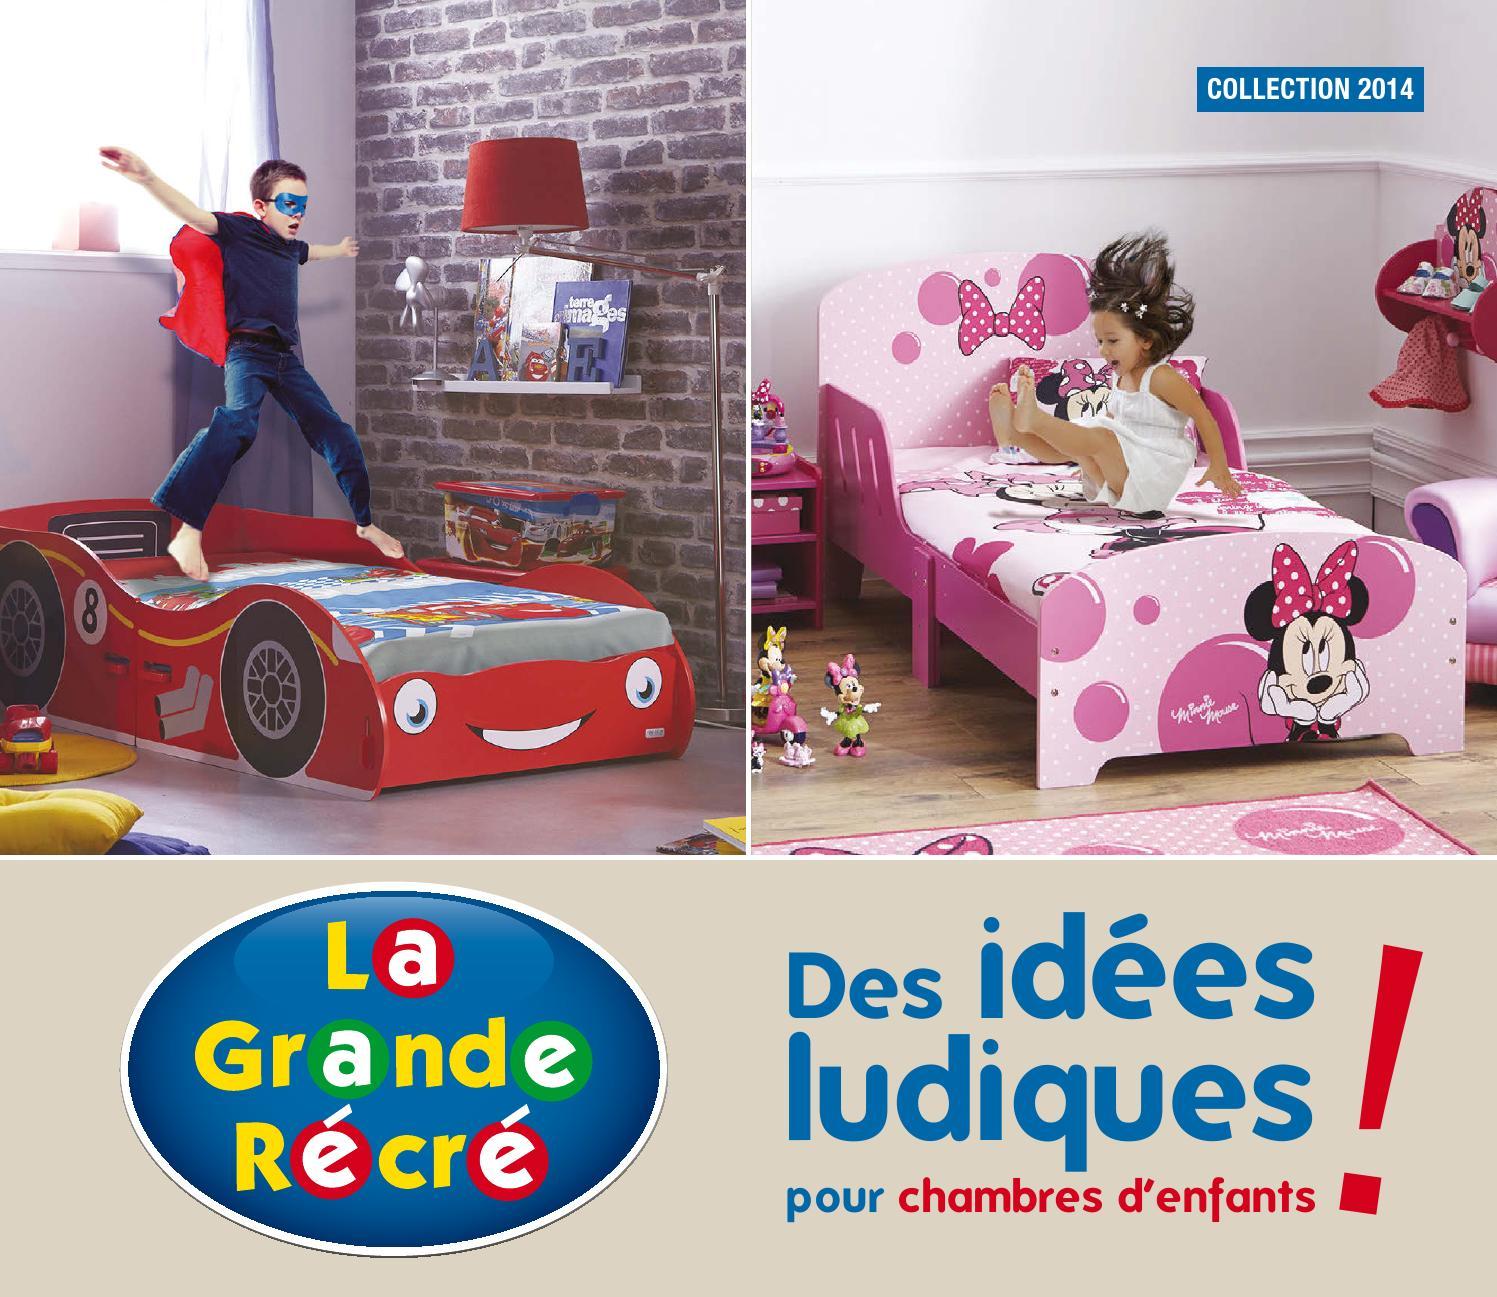 Catalogue La Grande Recre By Joe Monroe Issuu - Lit cabane la grande recre